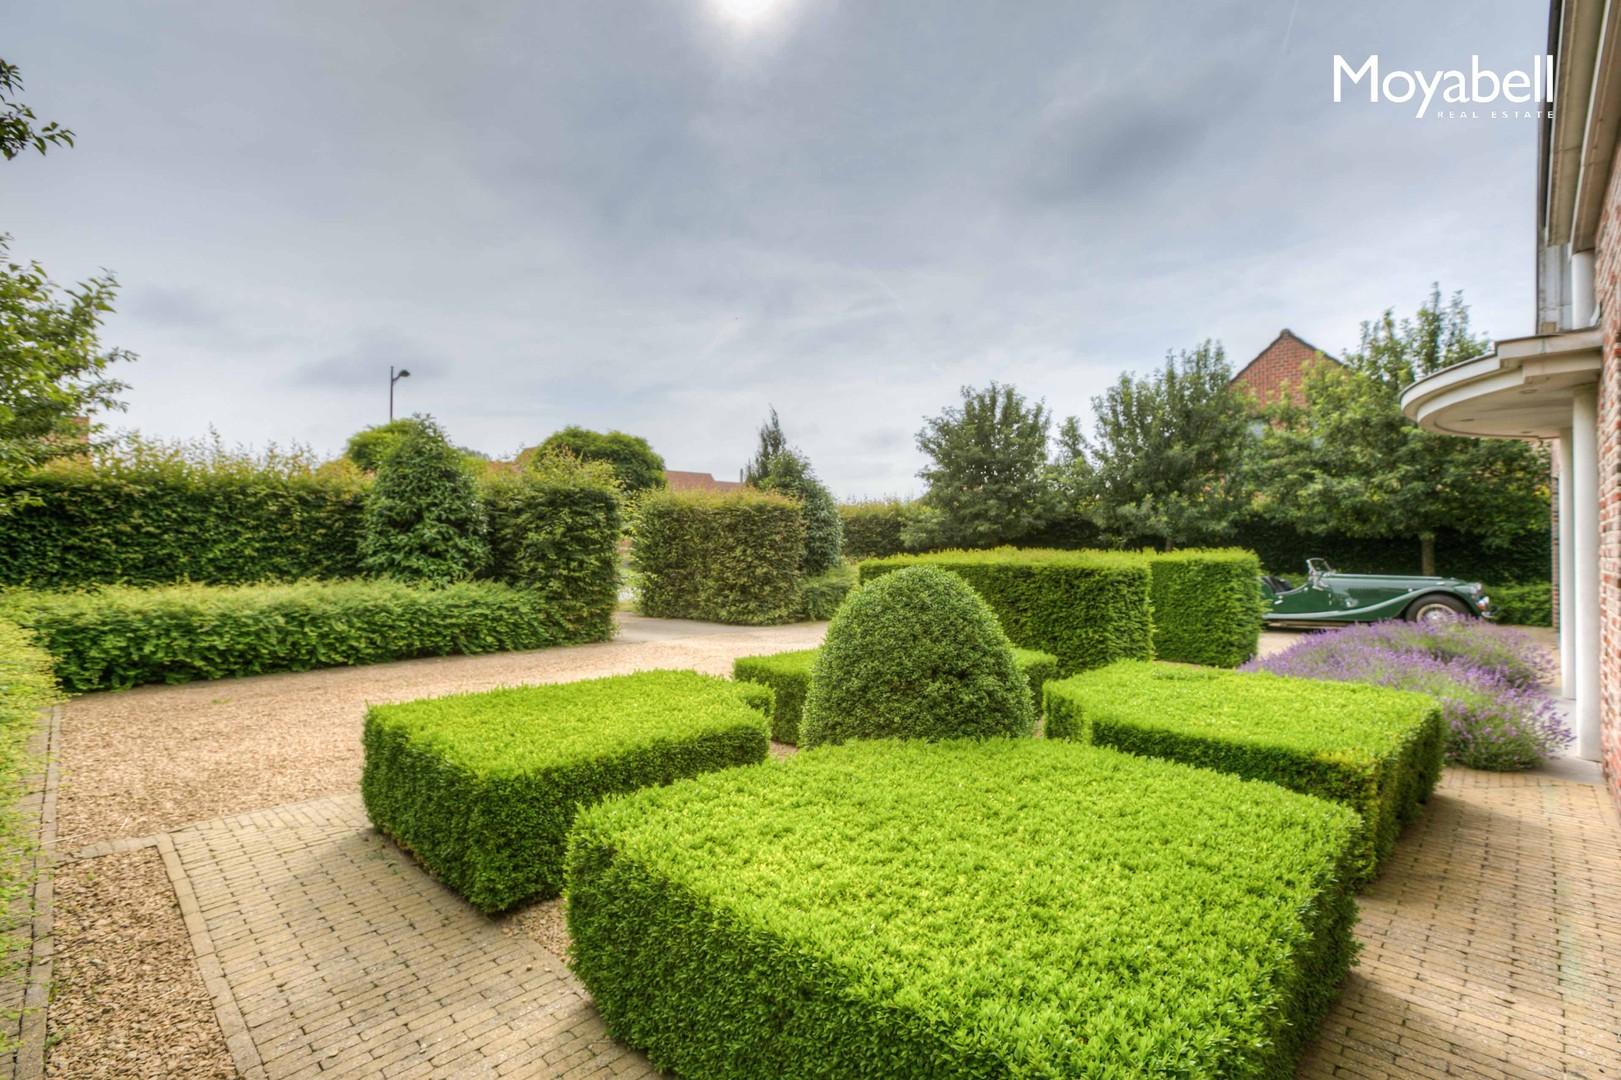 "Stijlvolle hedendaagse villa met zwembad in groene omgeving middenin het ""krekengebied""."